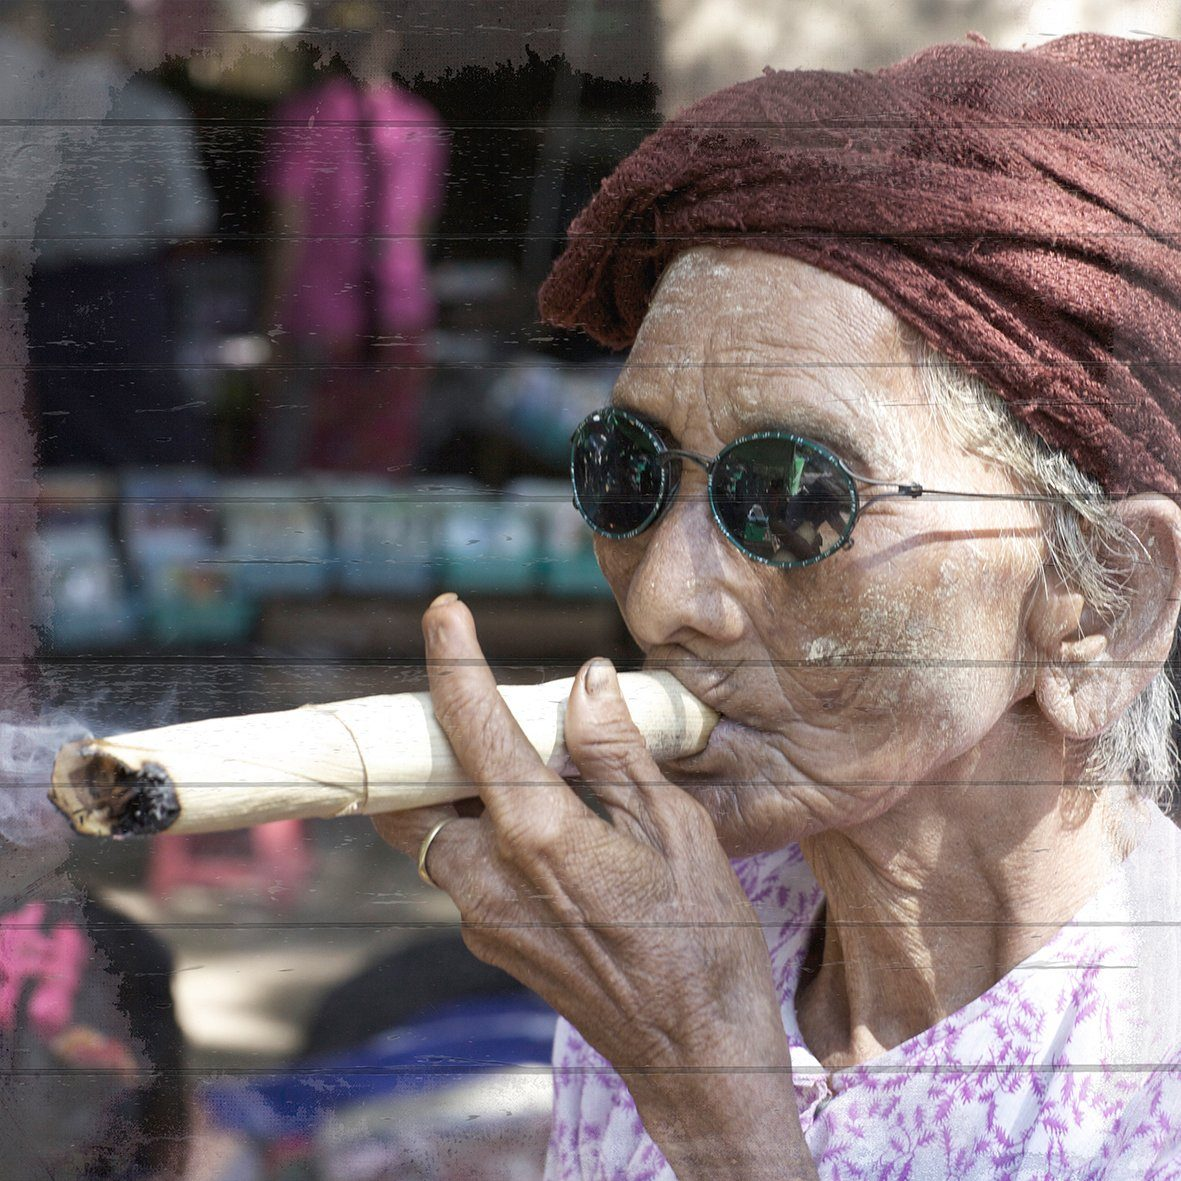 QUEENCE Holzbild »Cubanische Frau mit Zigarre«, 40x40 cm Echtholz